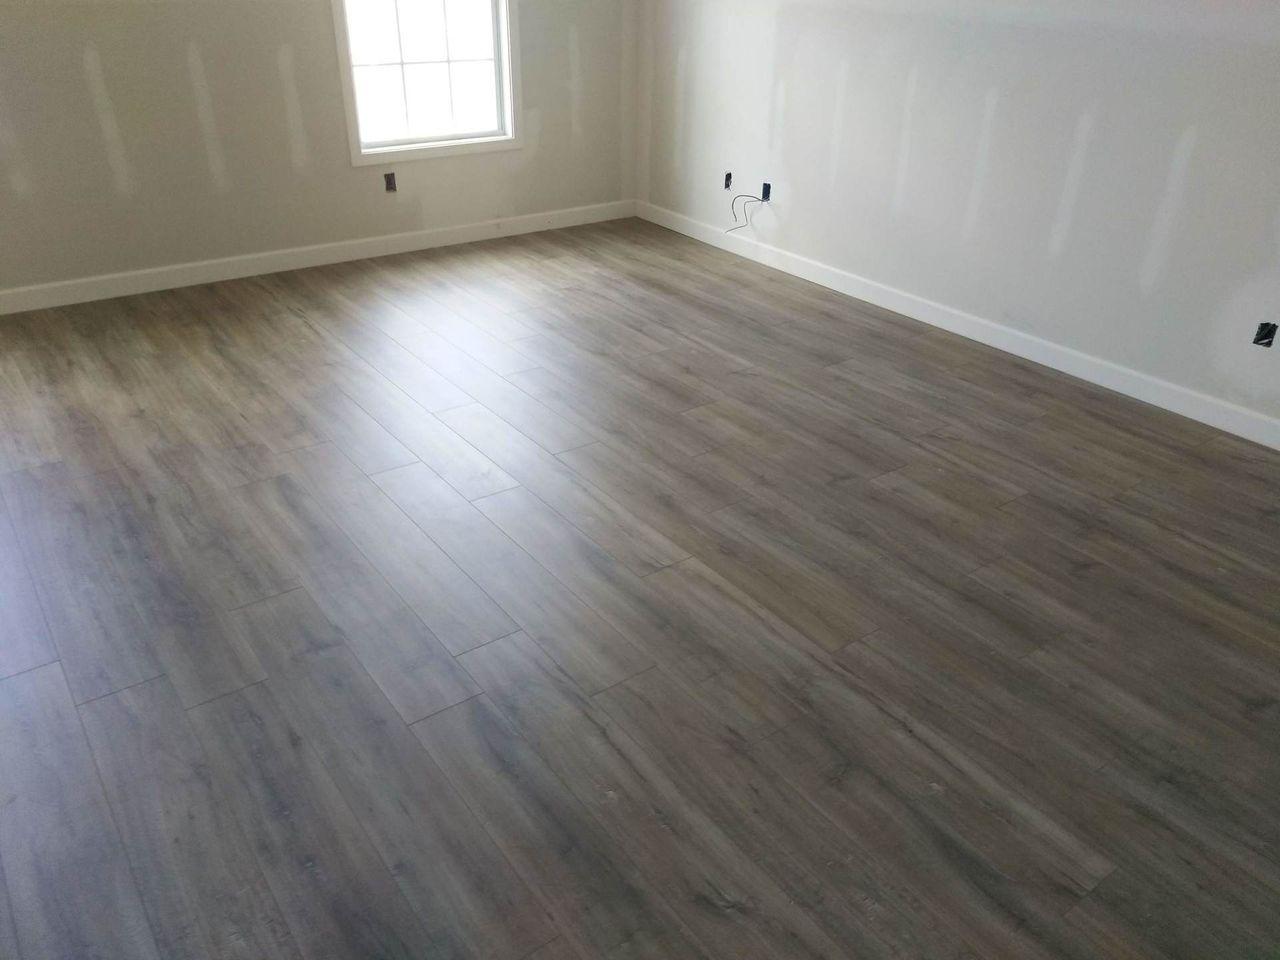 Luxury vinyl plank in Lexington, KY from Karrianna Flooring